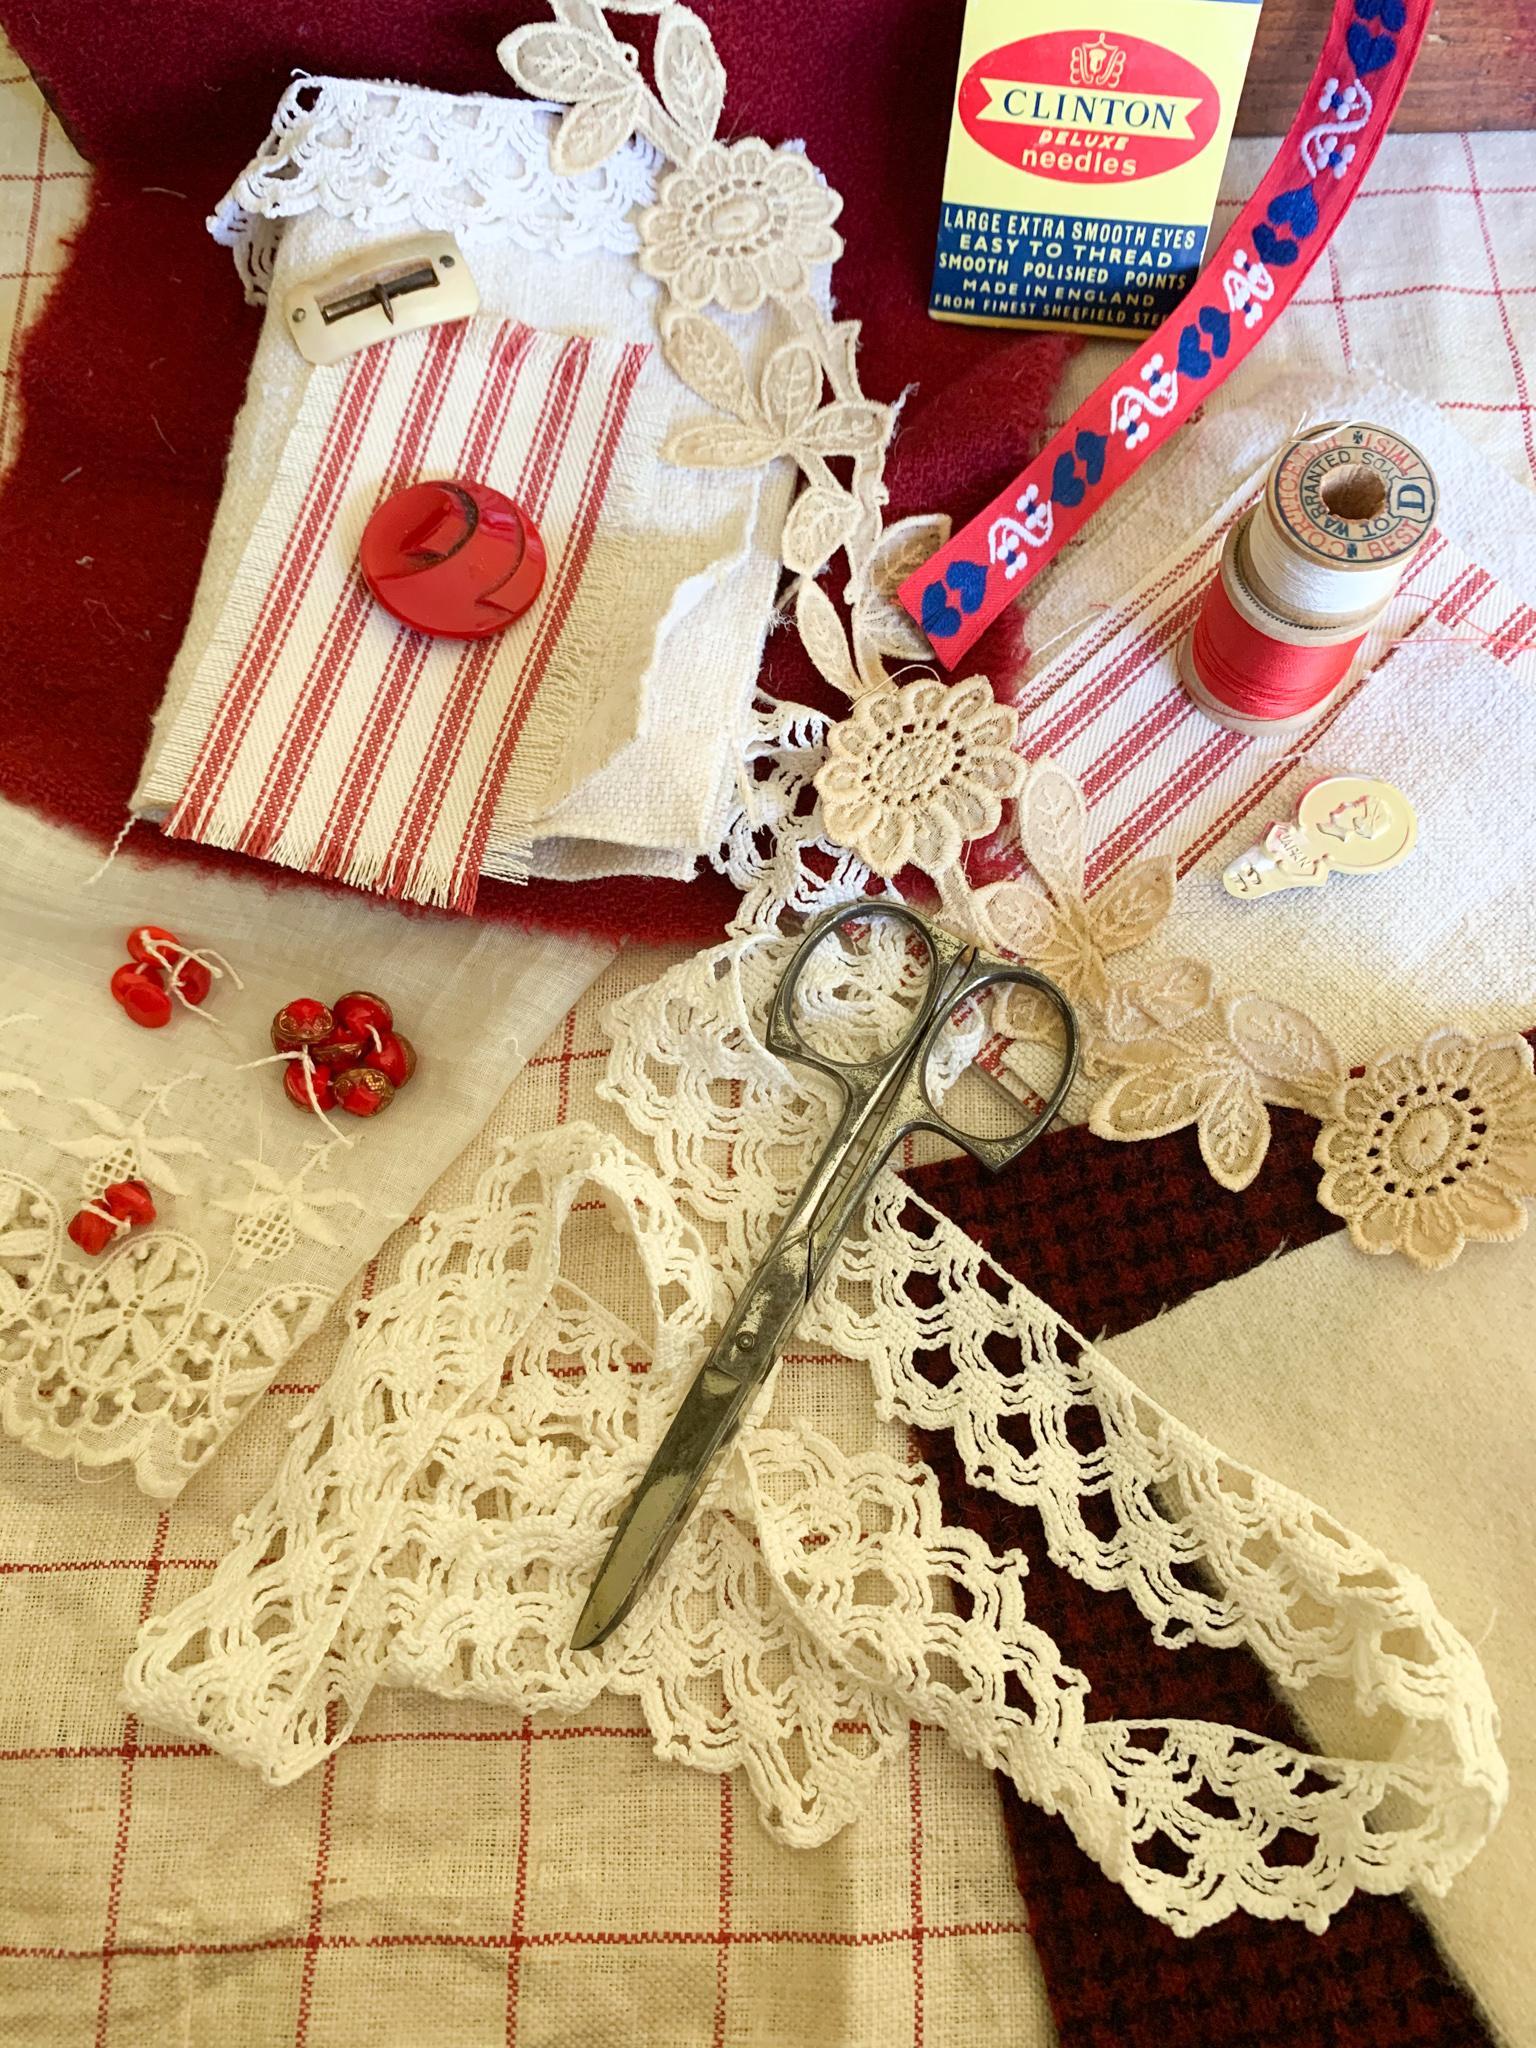 Materials for Needlekeeper